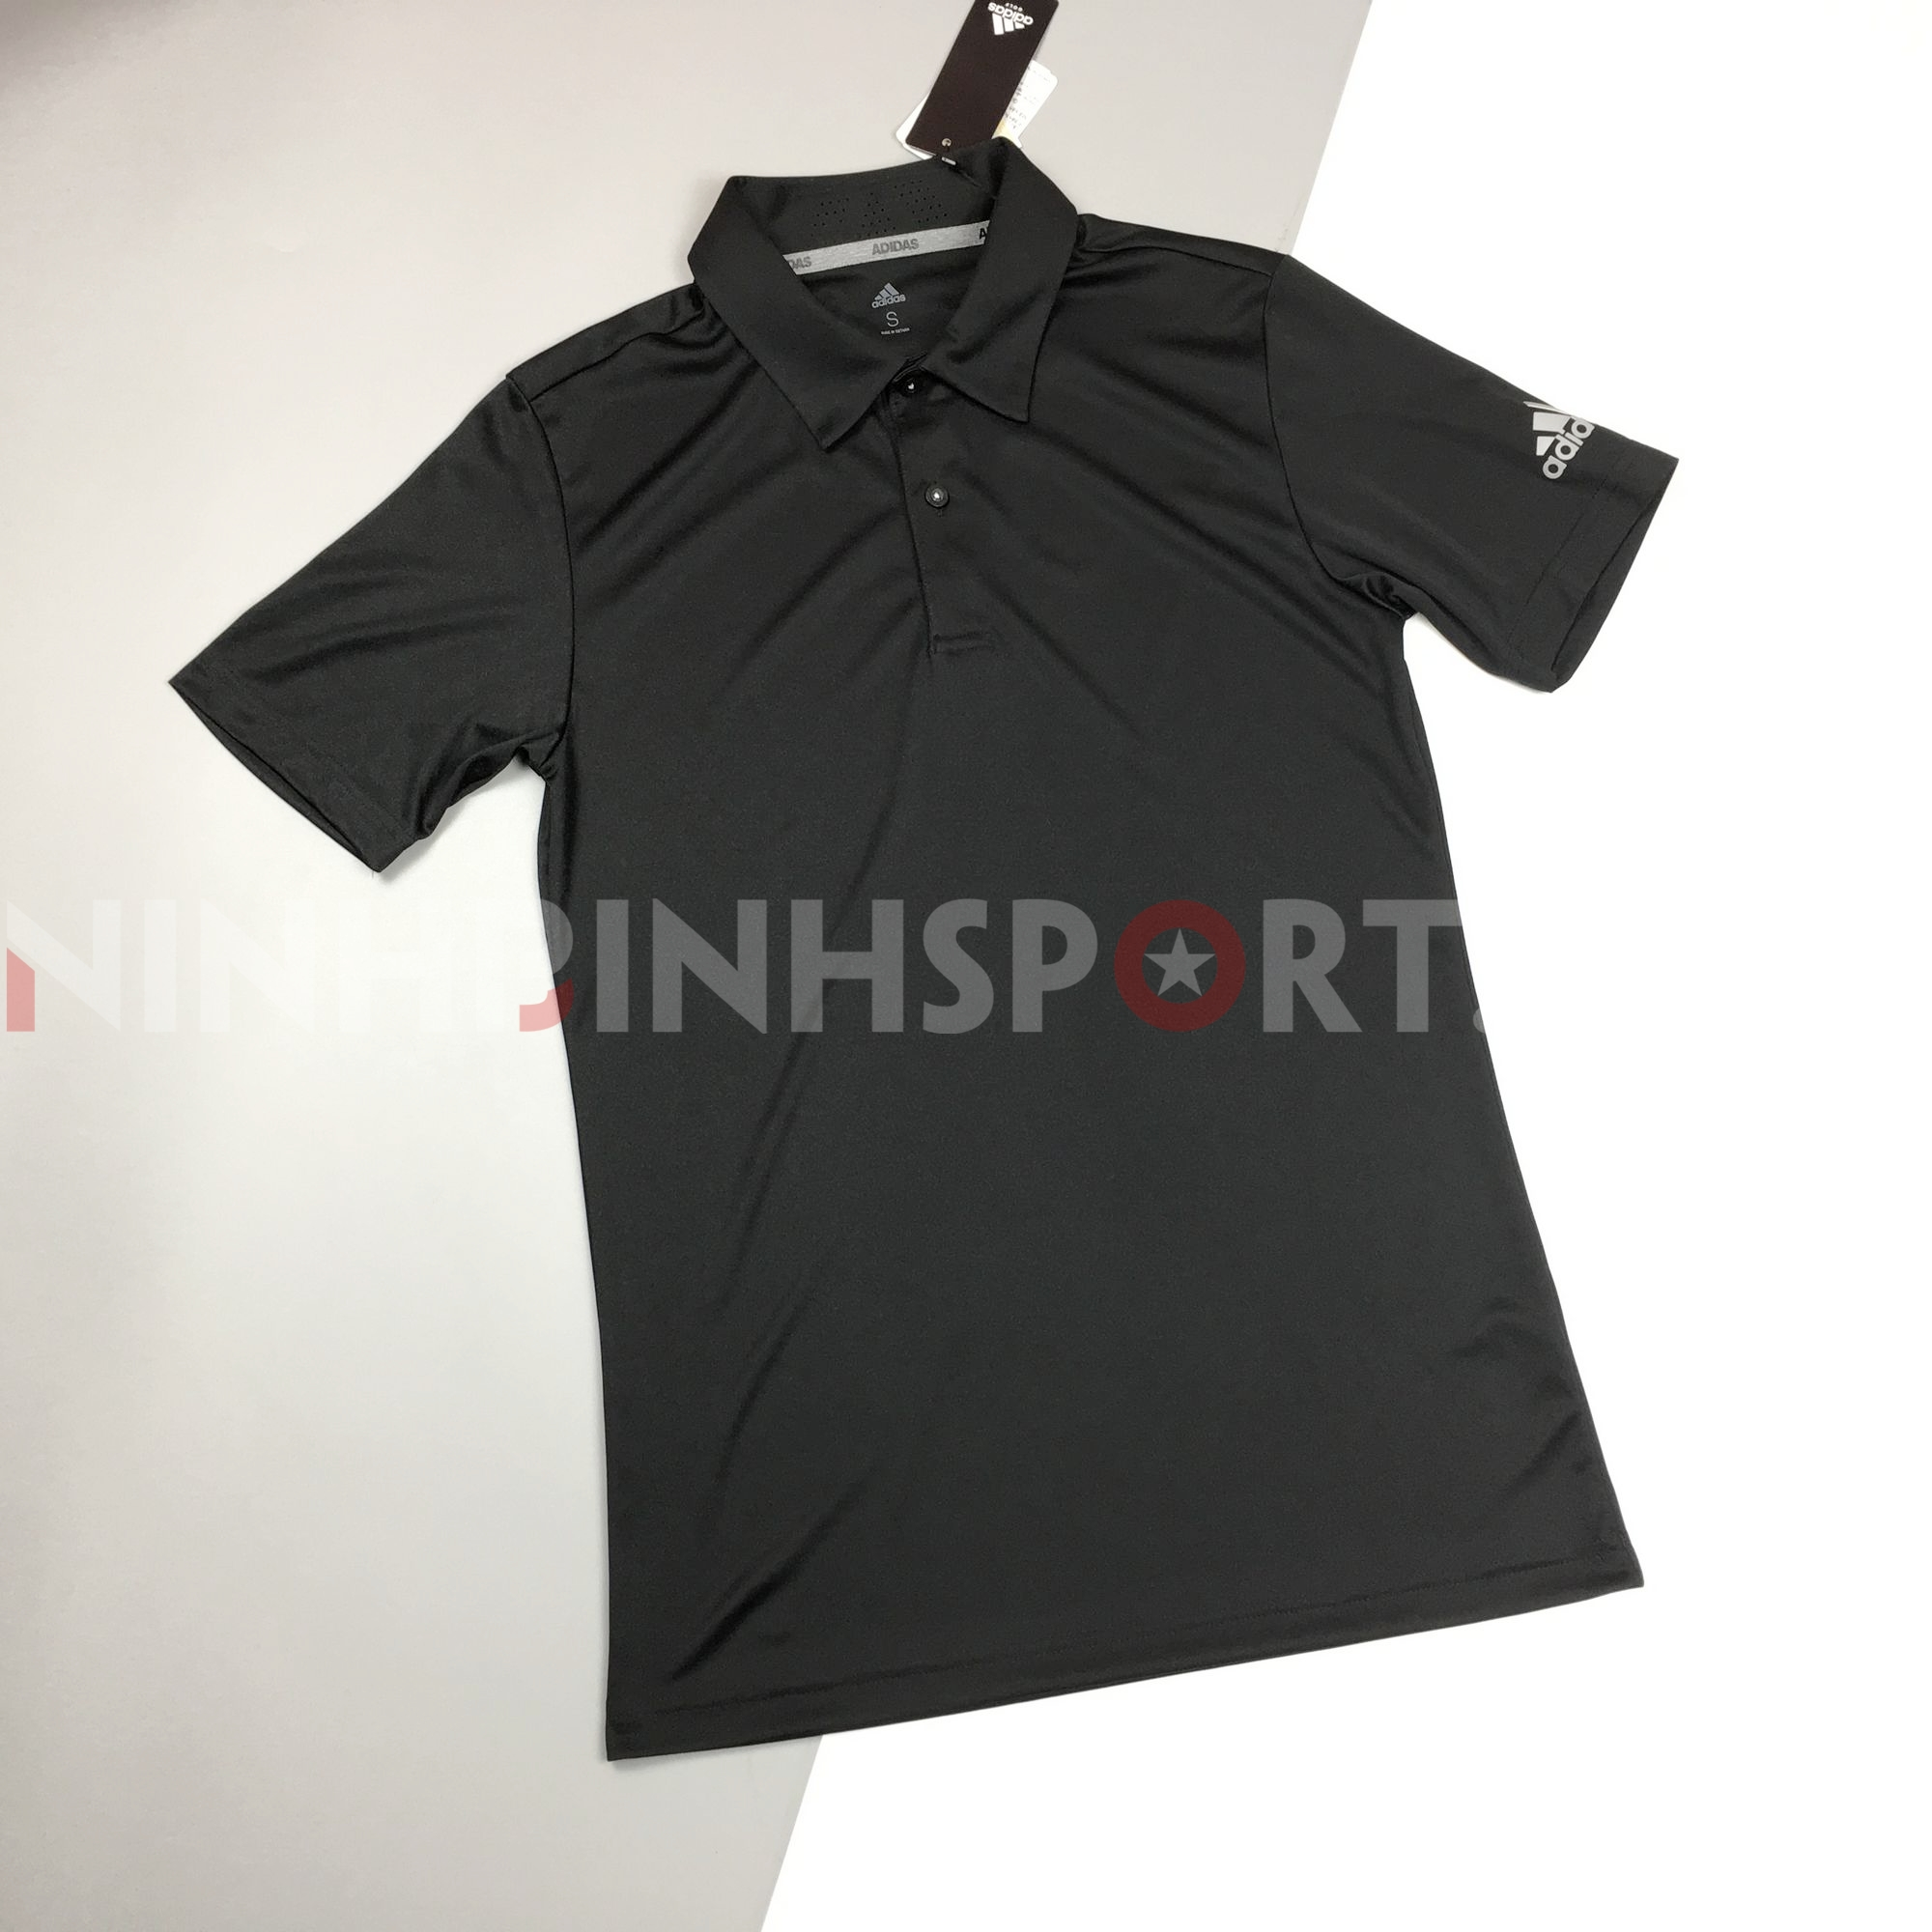 Áo thể thao nam Adidas Golf Polo - Black DW5598